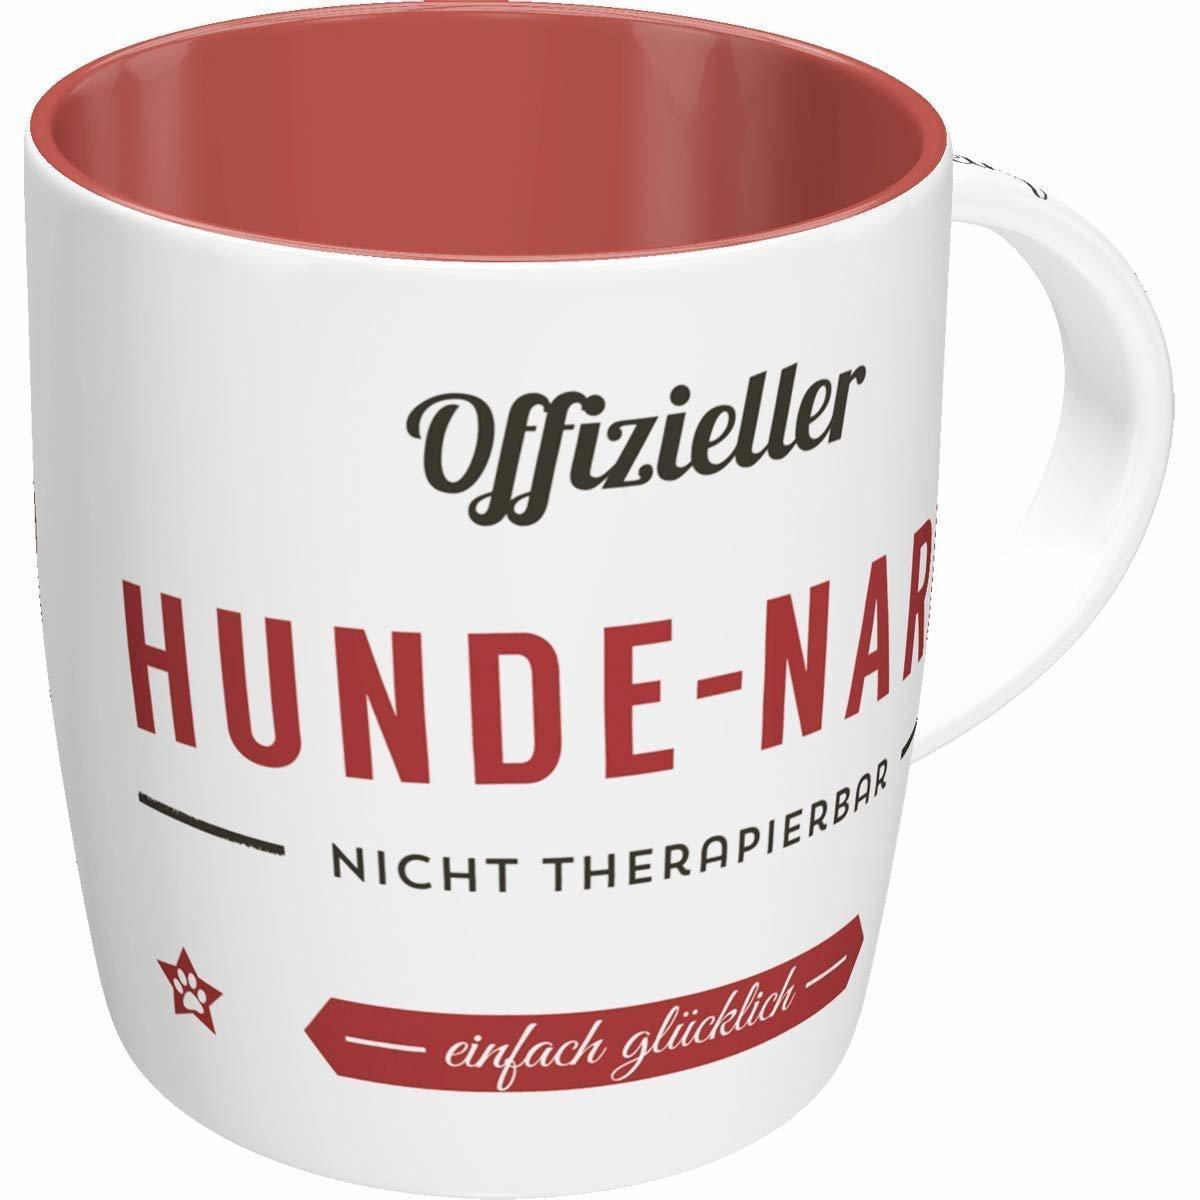 Nostalgic-Art Kaffee-Becher Hunde-Narr, 8,5 x 8,5 x 9 cm